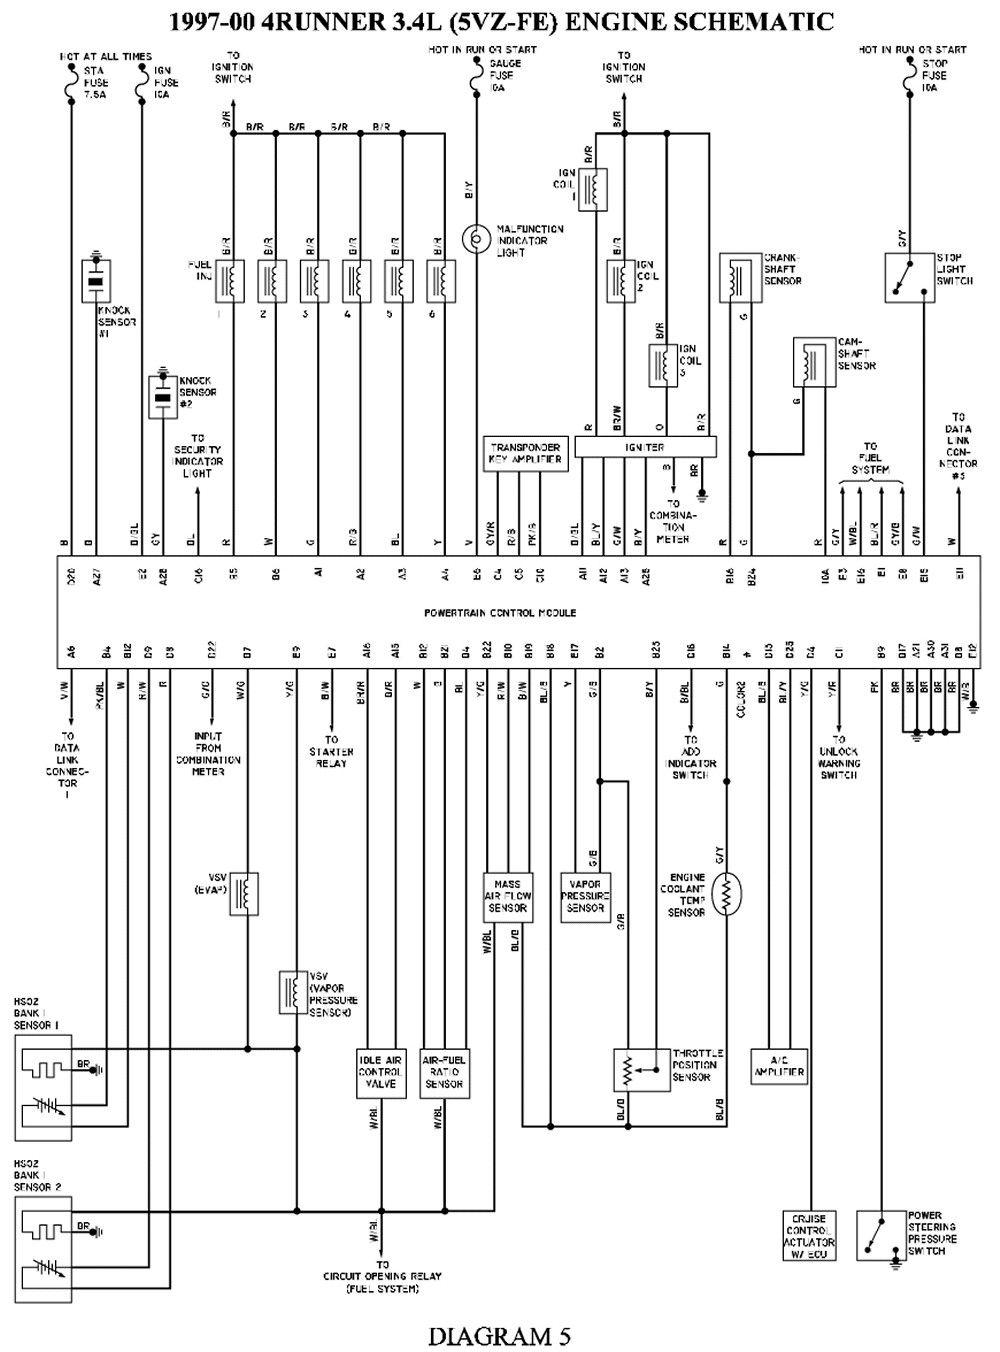 Fujitsu Ten 135000 1440b101 Wiring Diagram New In 2020 Toyota 4runner Electrical Wiring Diagram Diagram